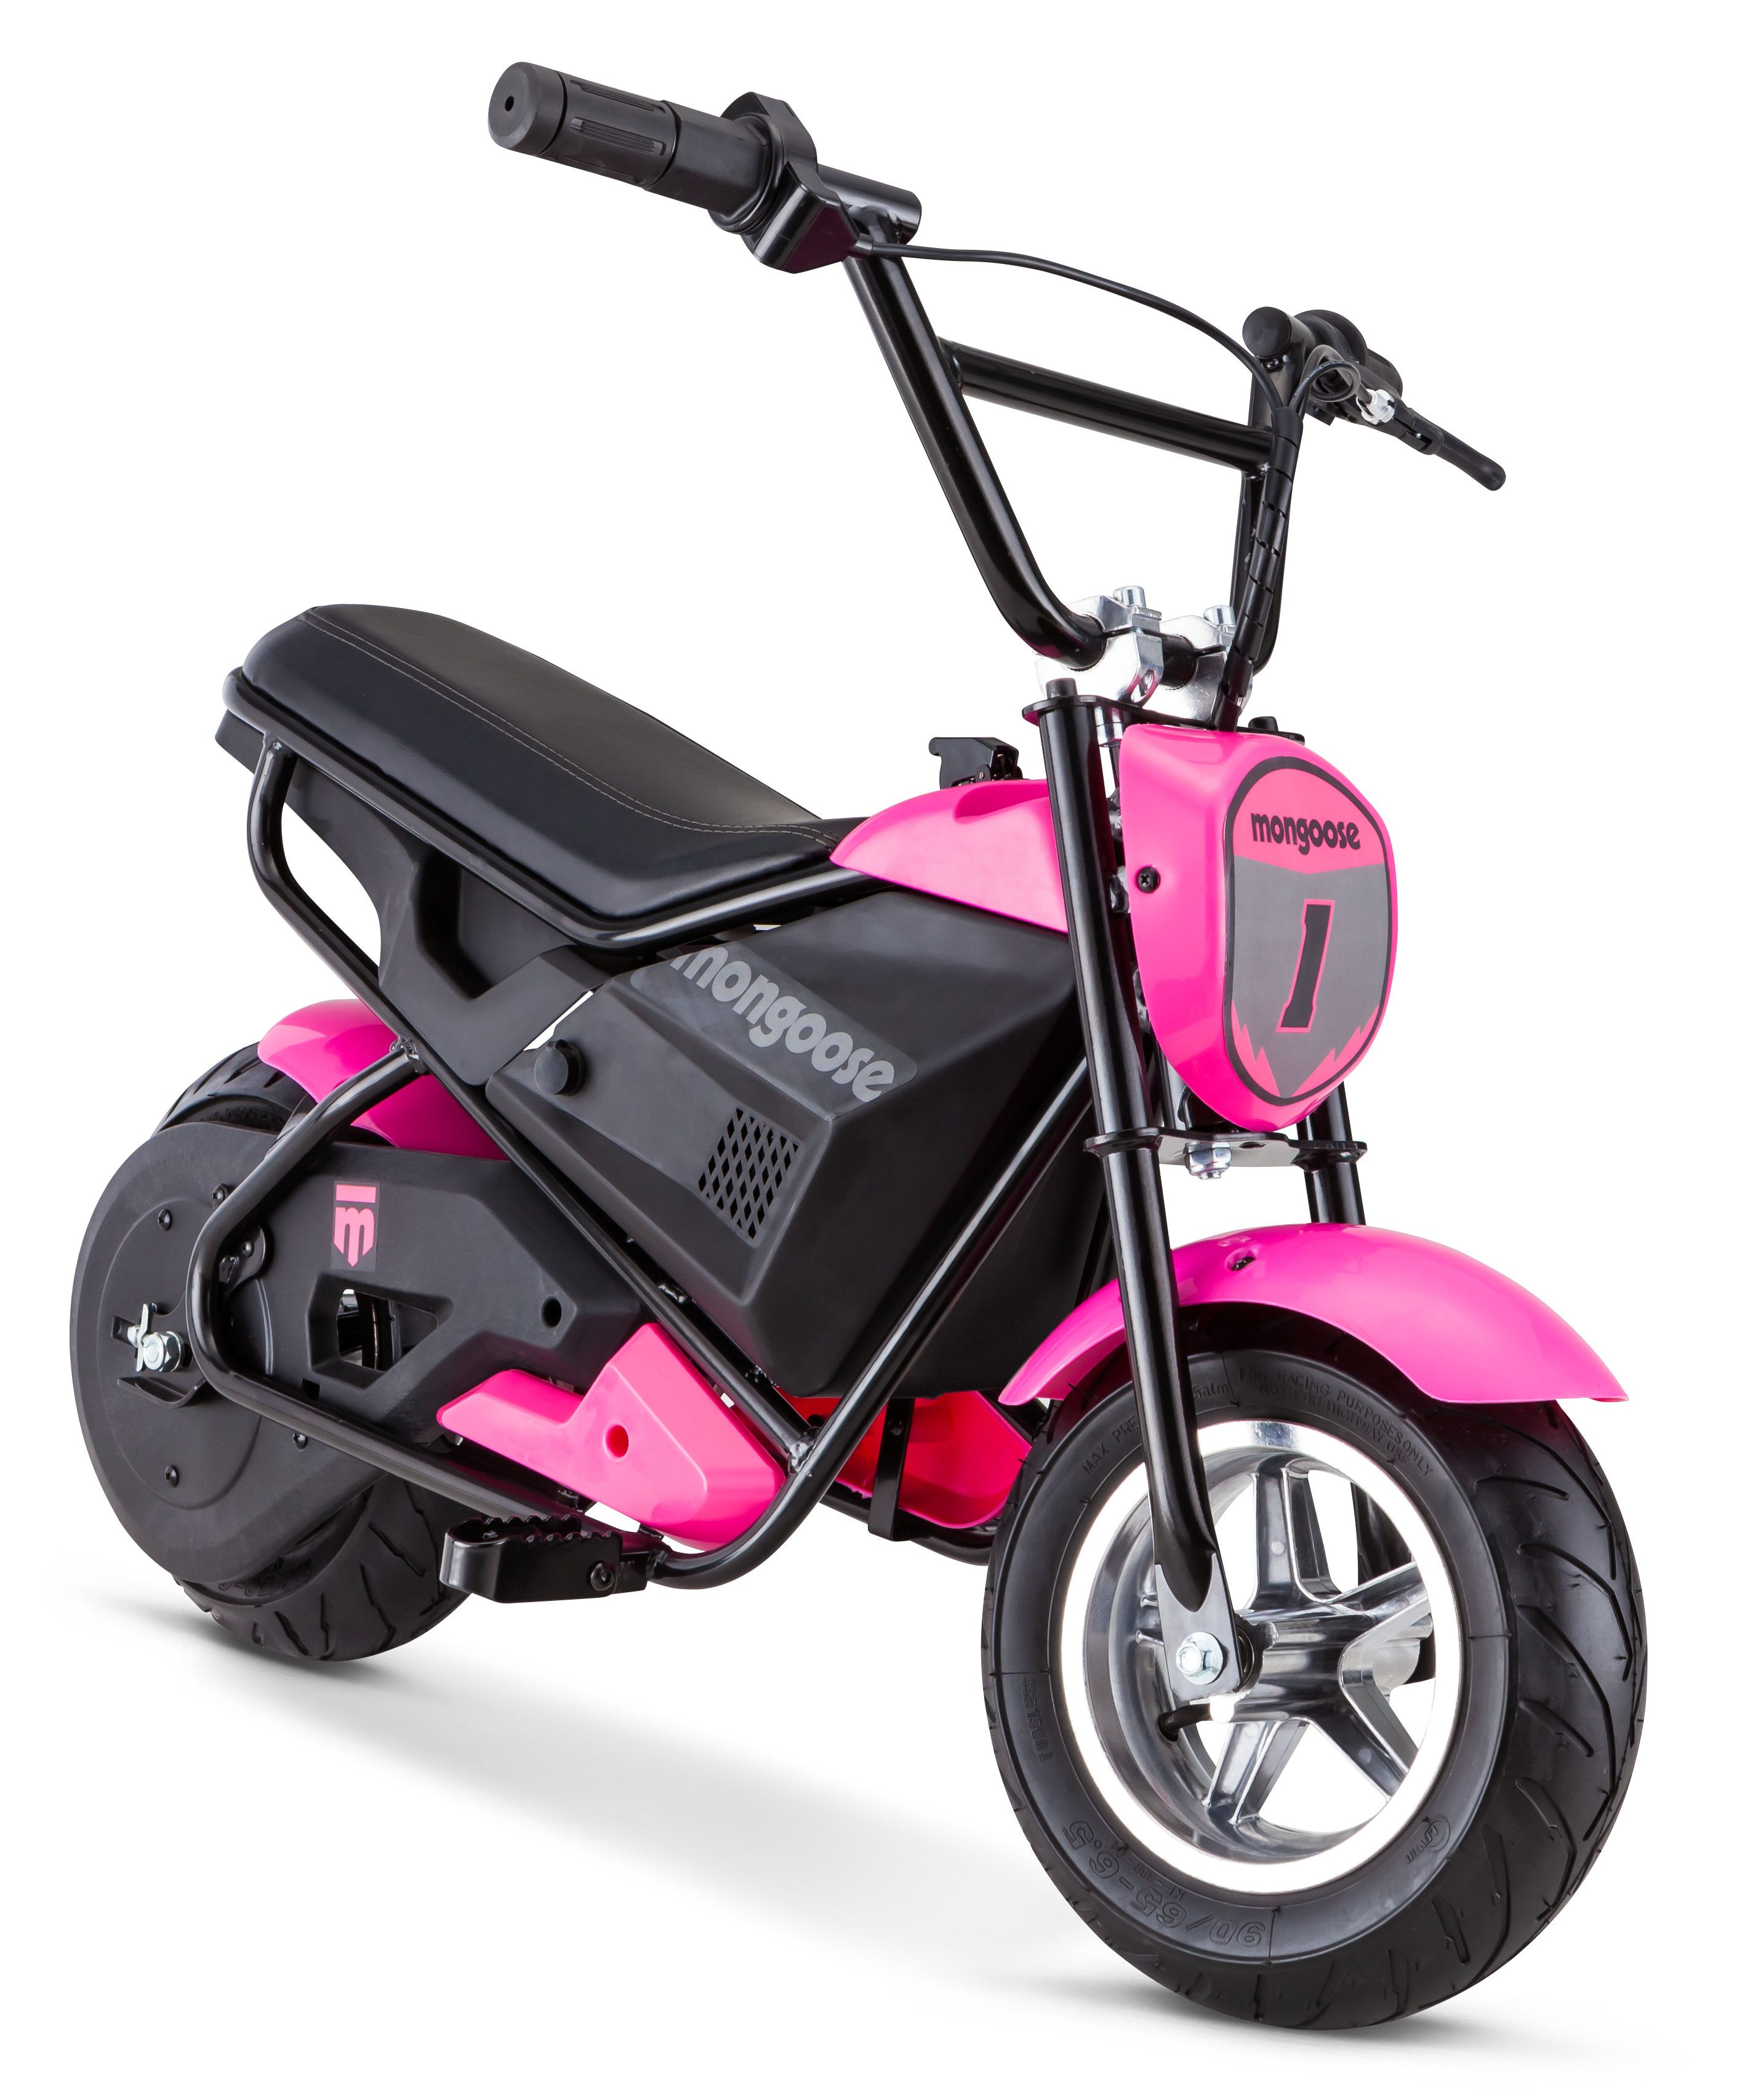 hight resolution of mongoose 24 volt powered mini bike pink hondaelectricscooter electricbikeforkids tvsbike jawabike